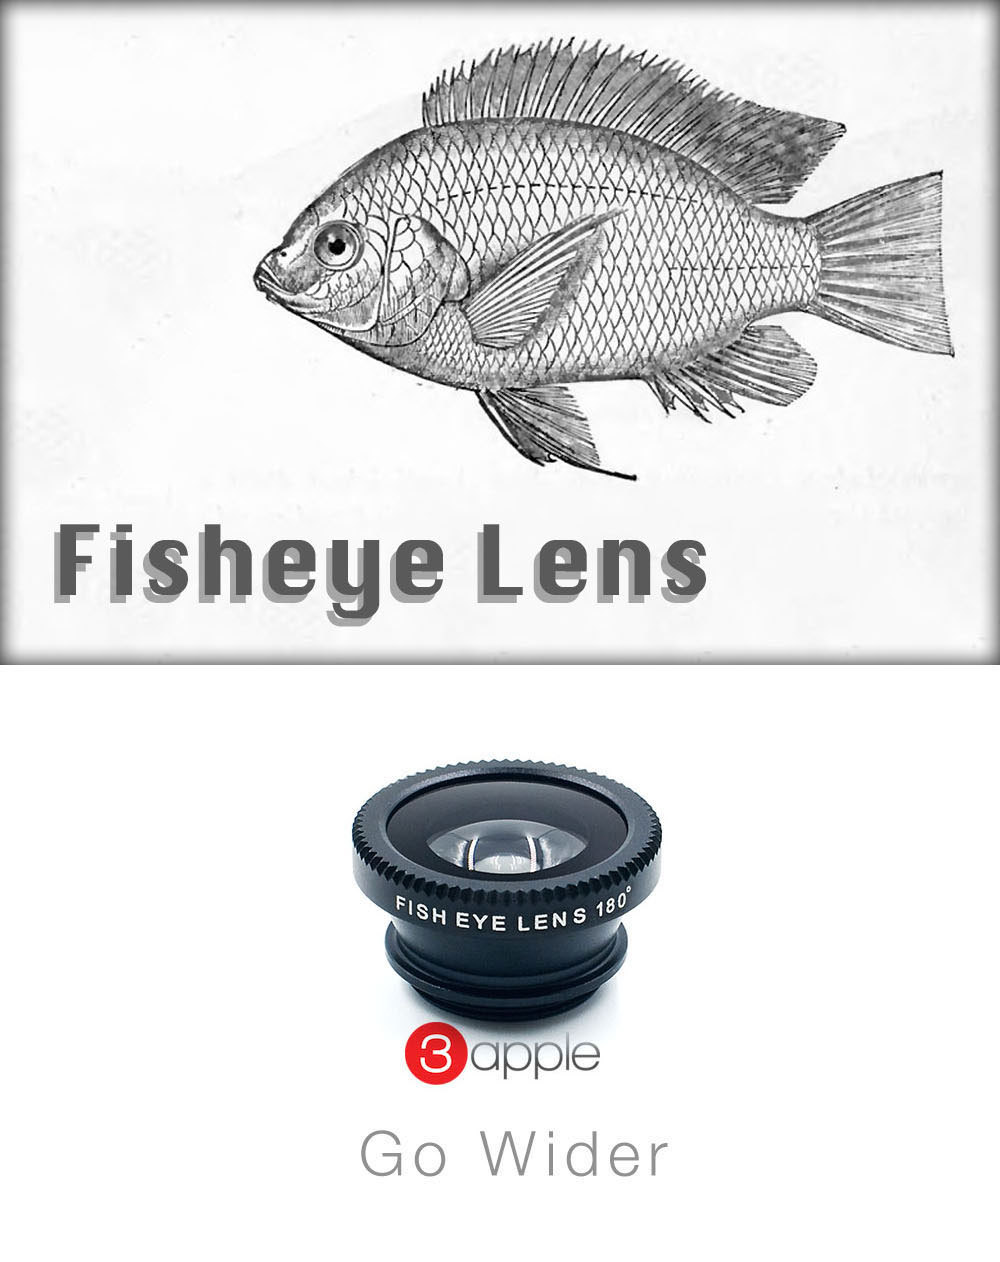 Universal Fisheye Fish eye lente para camera de celular Lens For iphone 4 nexus 5 samsung galaxy s5 S4 phone lente olho de peixe  Compatible Brand Apple iPhonesBlackberryHTCLGMotorolaNokiaPalmPanasoni